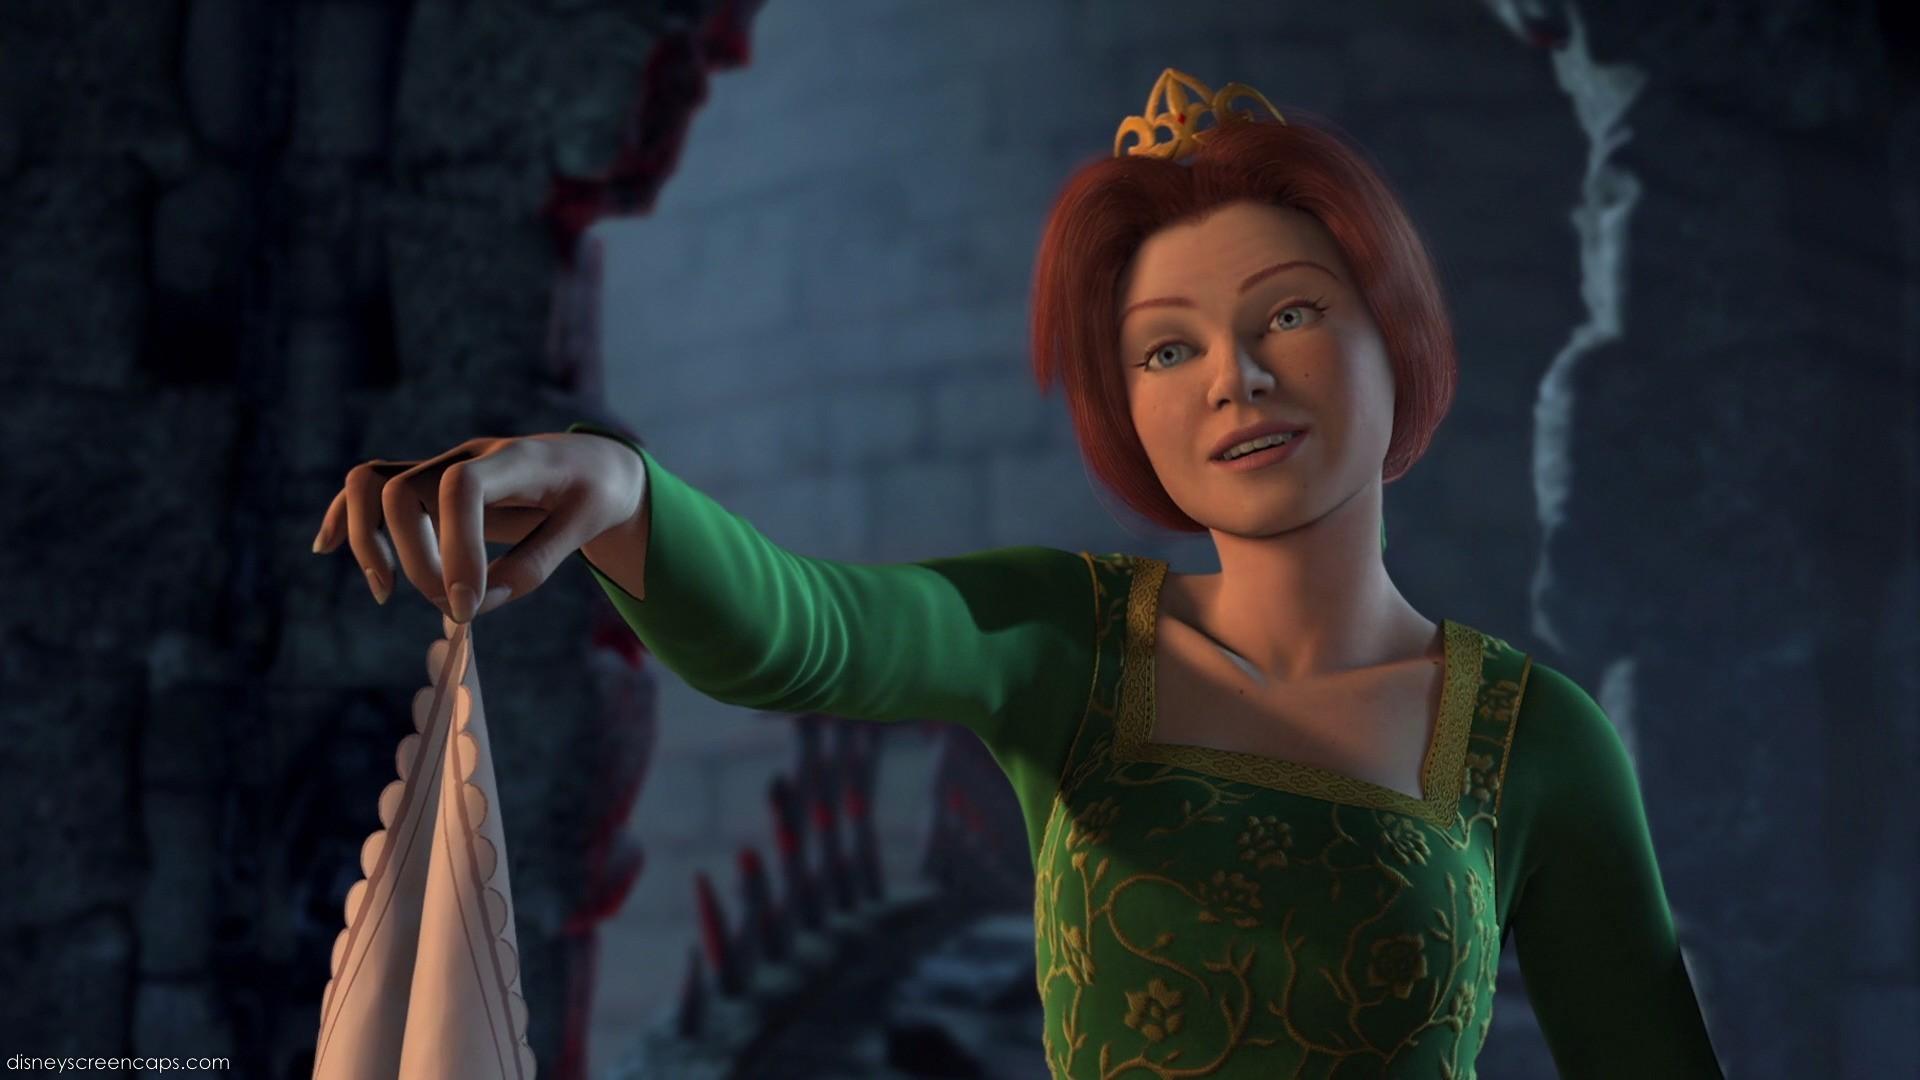 La princesa fiona shrek wiki fandom powered by wikia - Princesse fiona ...